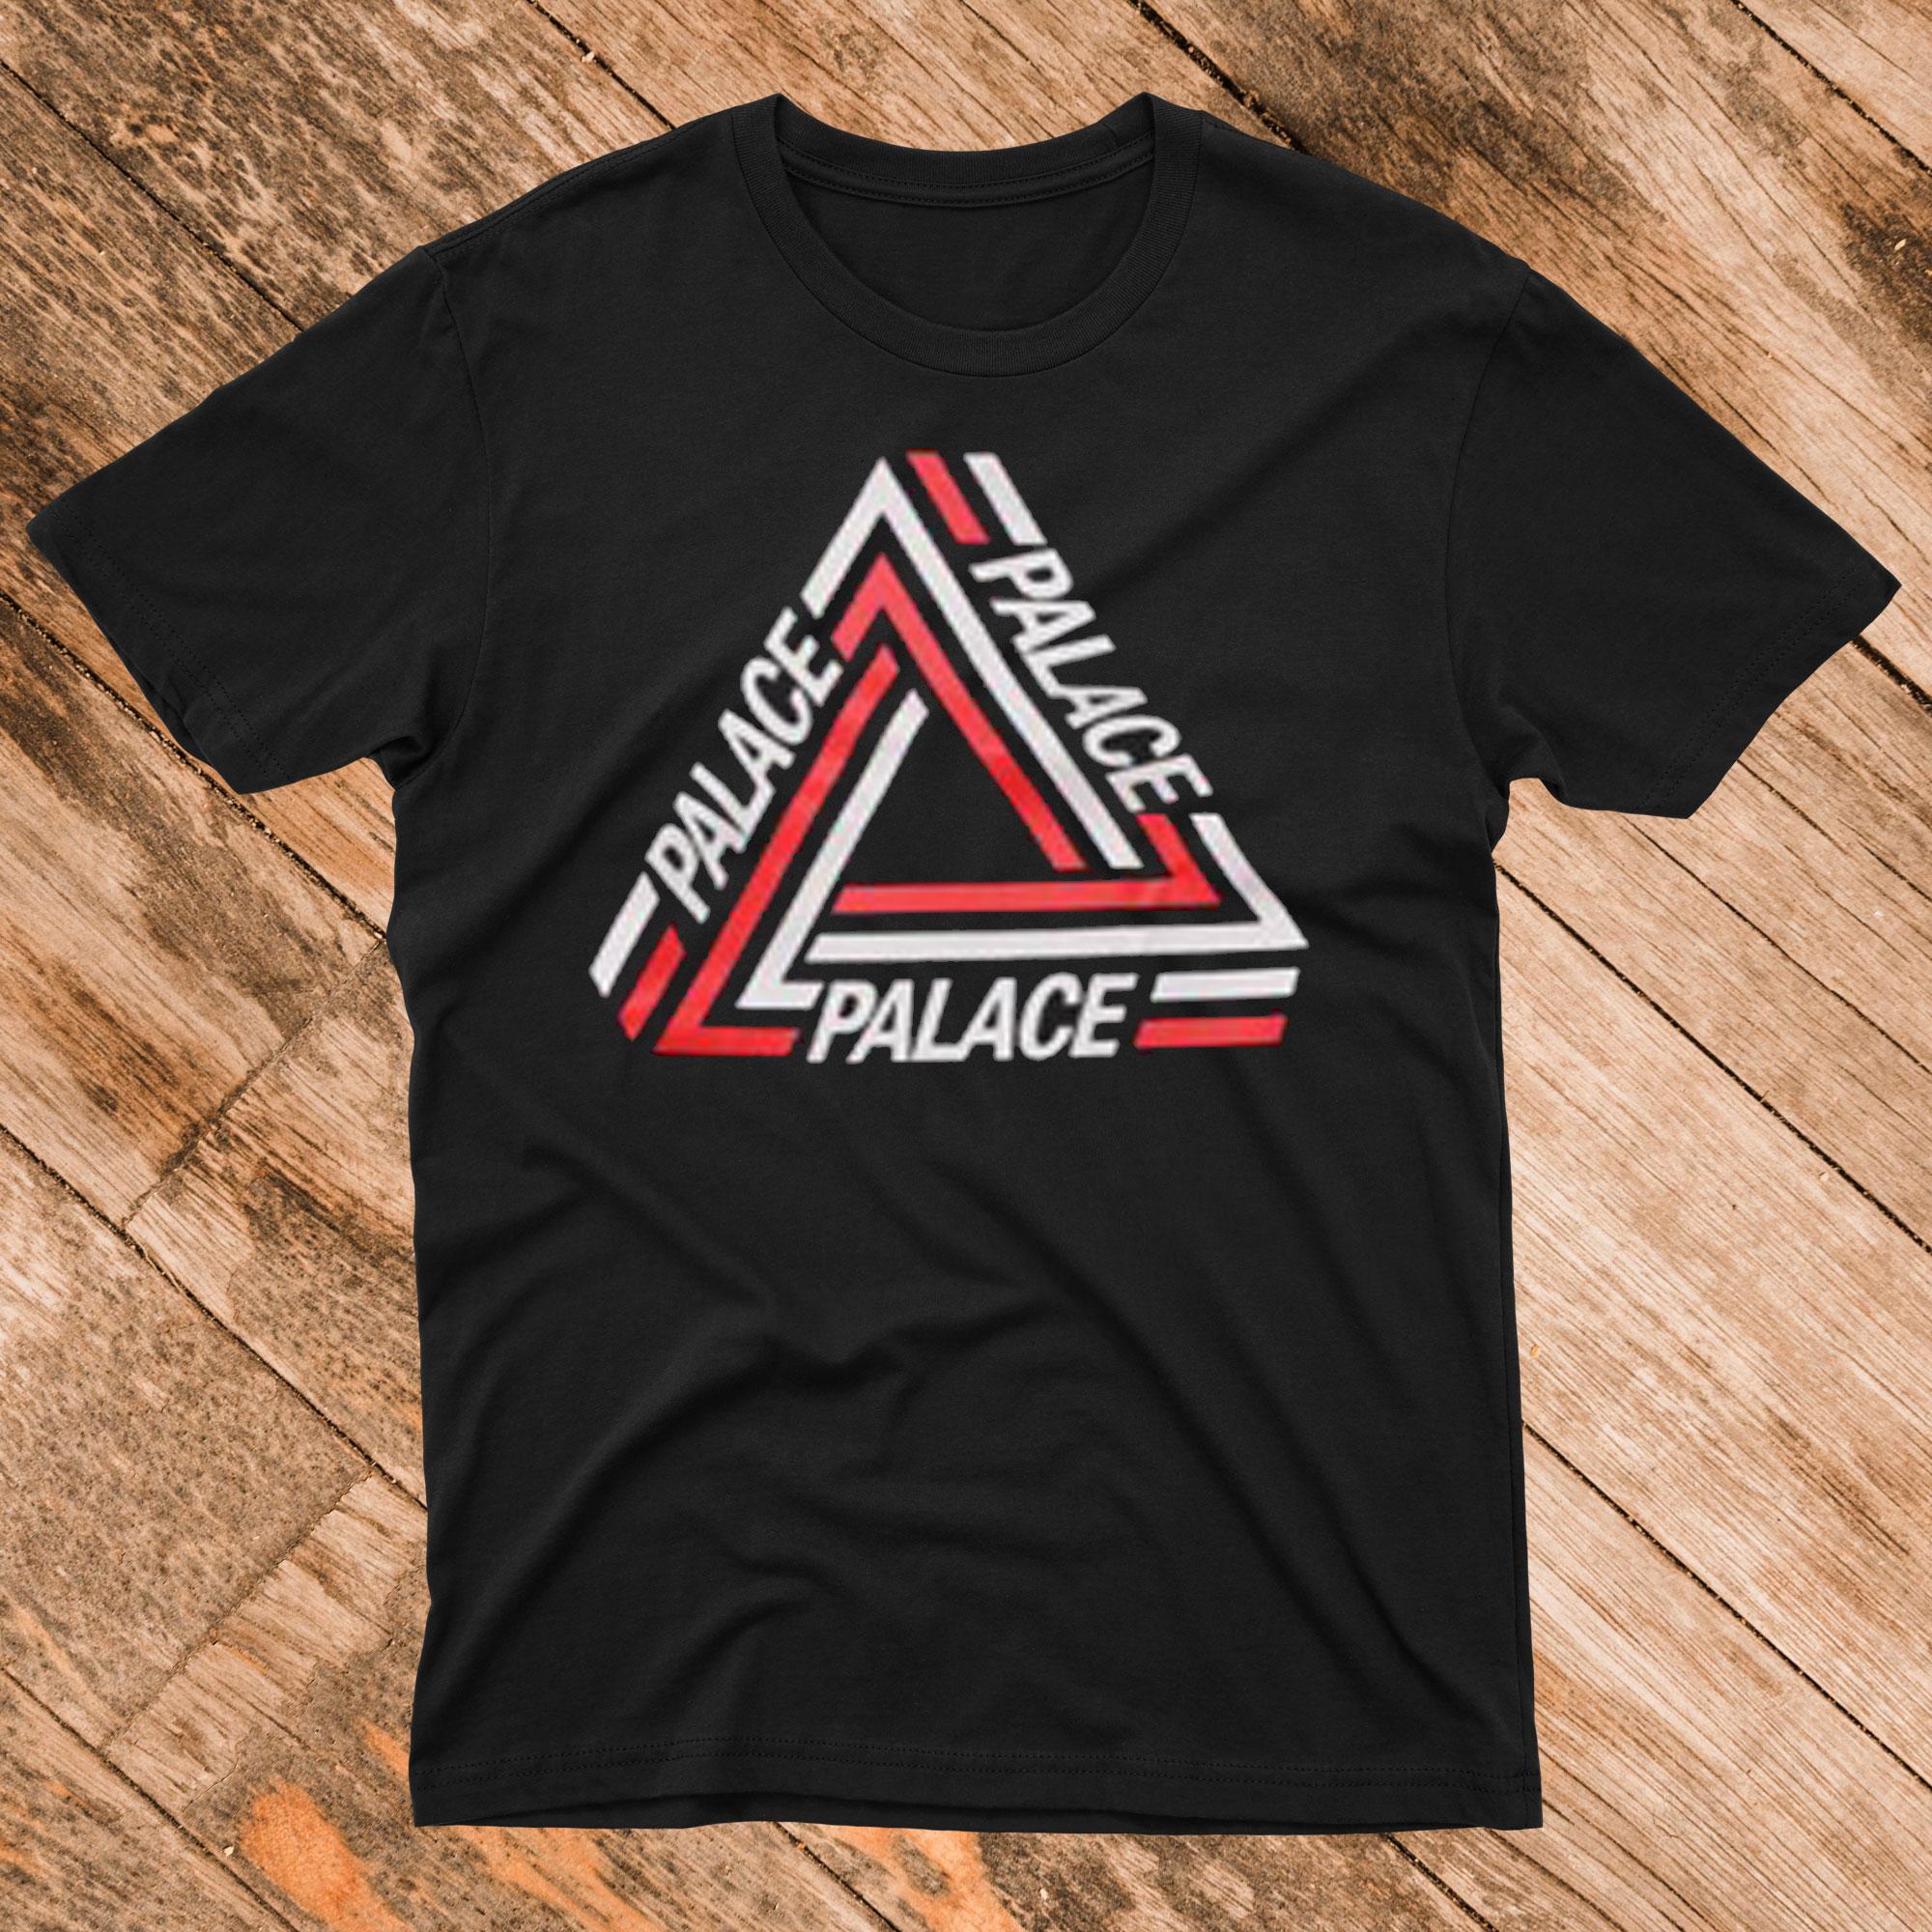 Palace Tshirt Black White